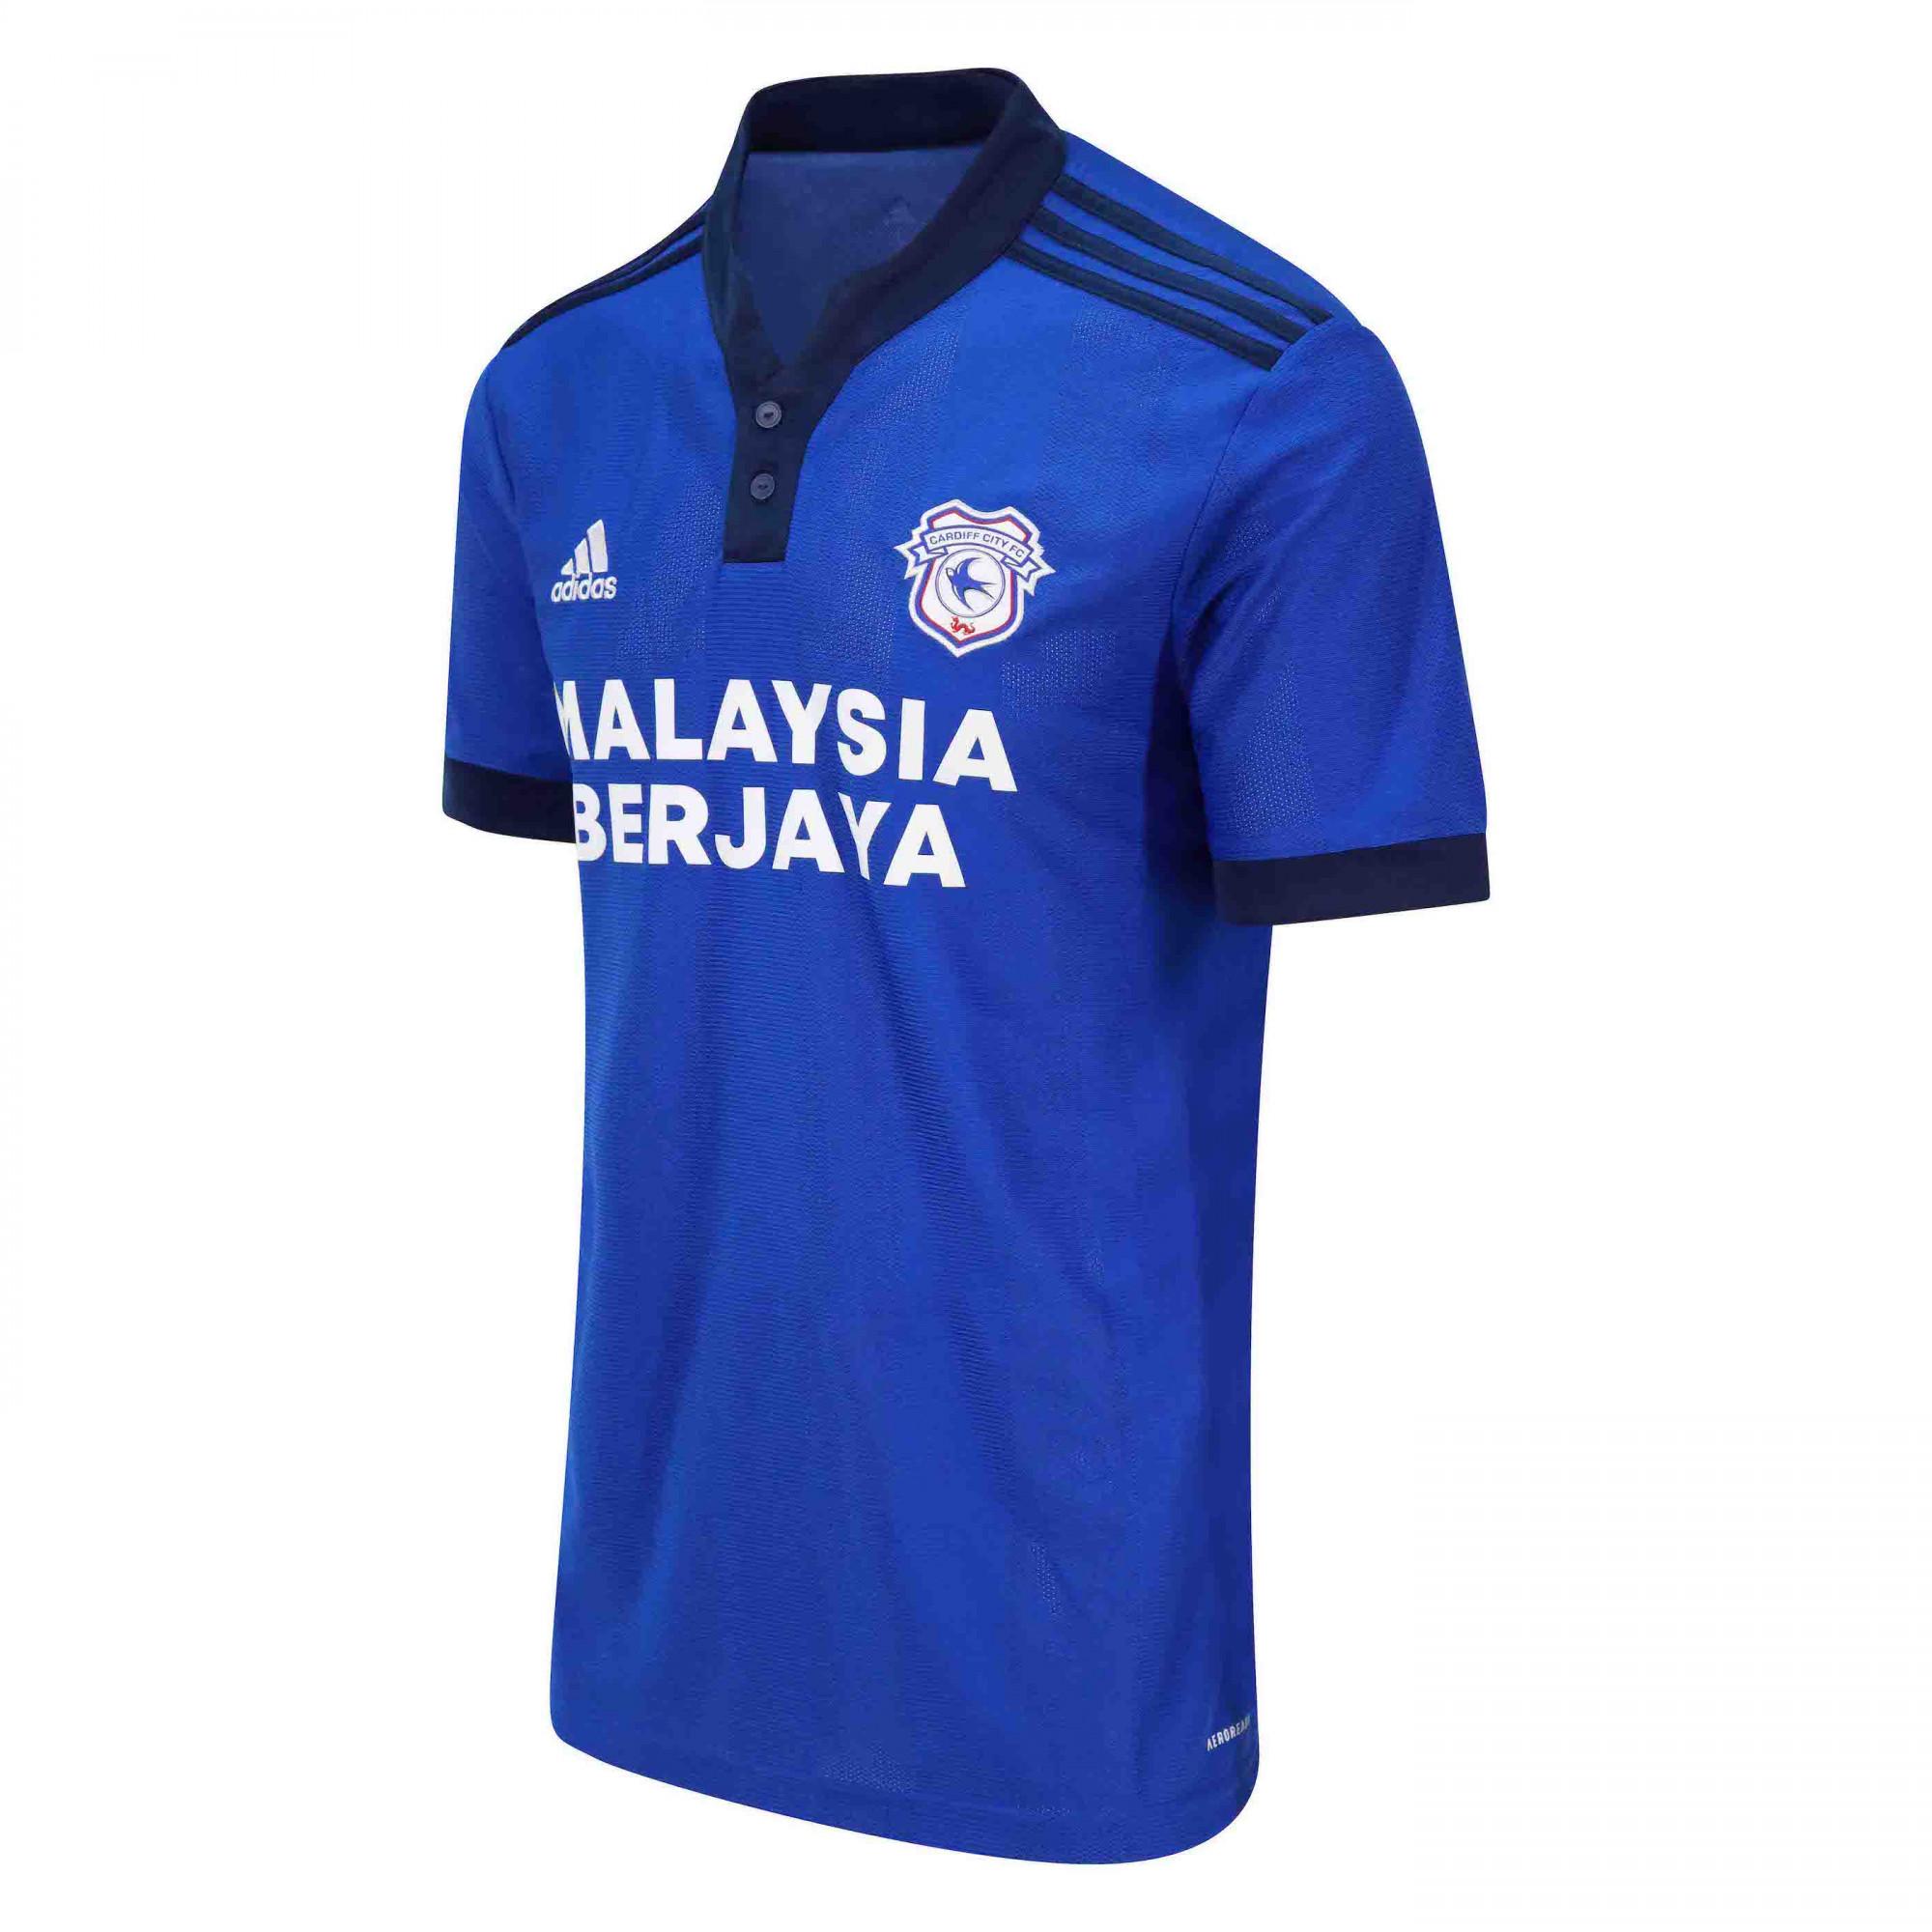 Cardiff City 2021-22 Adidas Home Shirt   21/22 Kits   Football ...